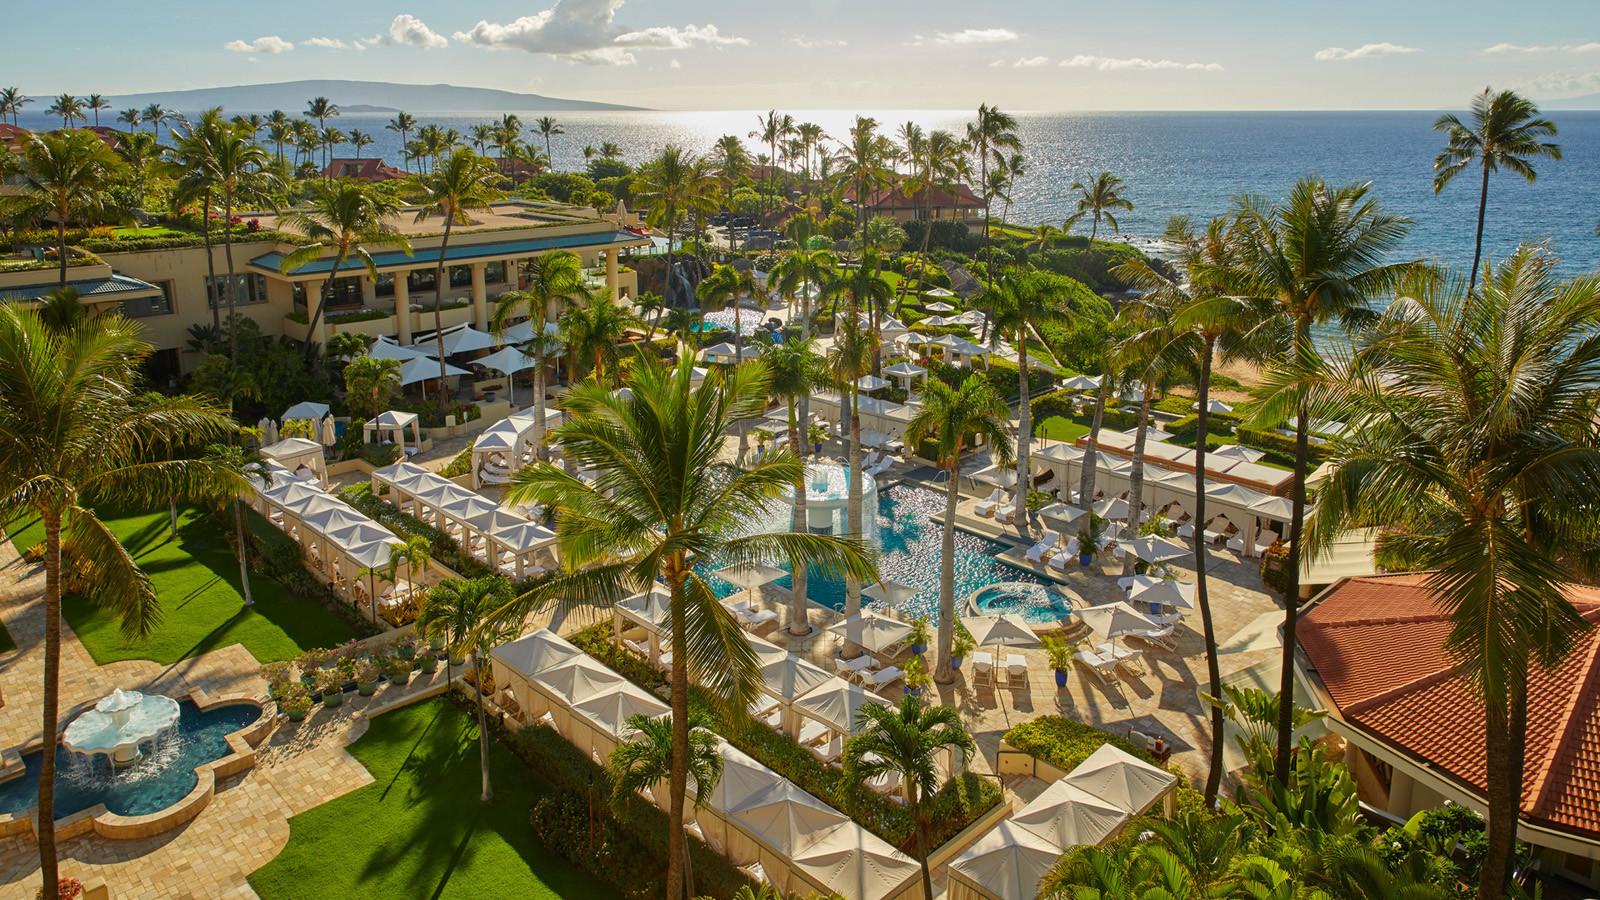 news-main-four-seasons-resort-maui-at-wailea-welcomes-back-ben-shank-as-general-manager.1626262836.jpg